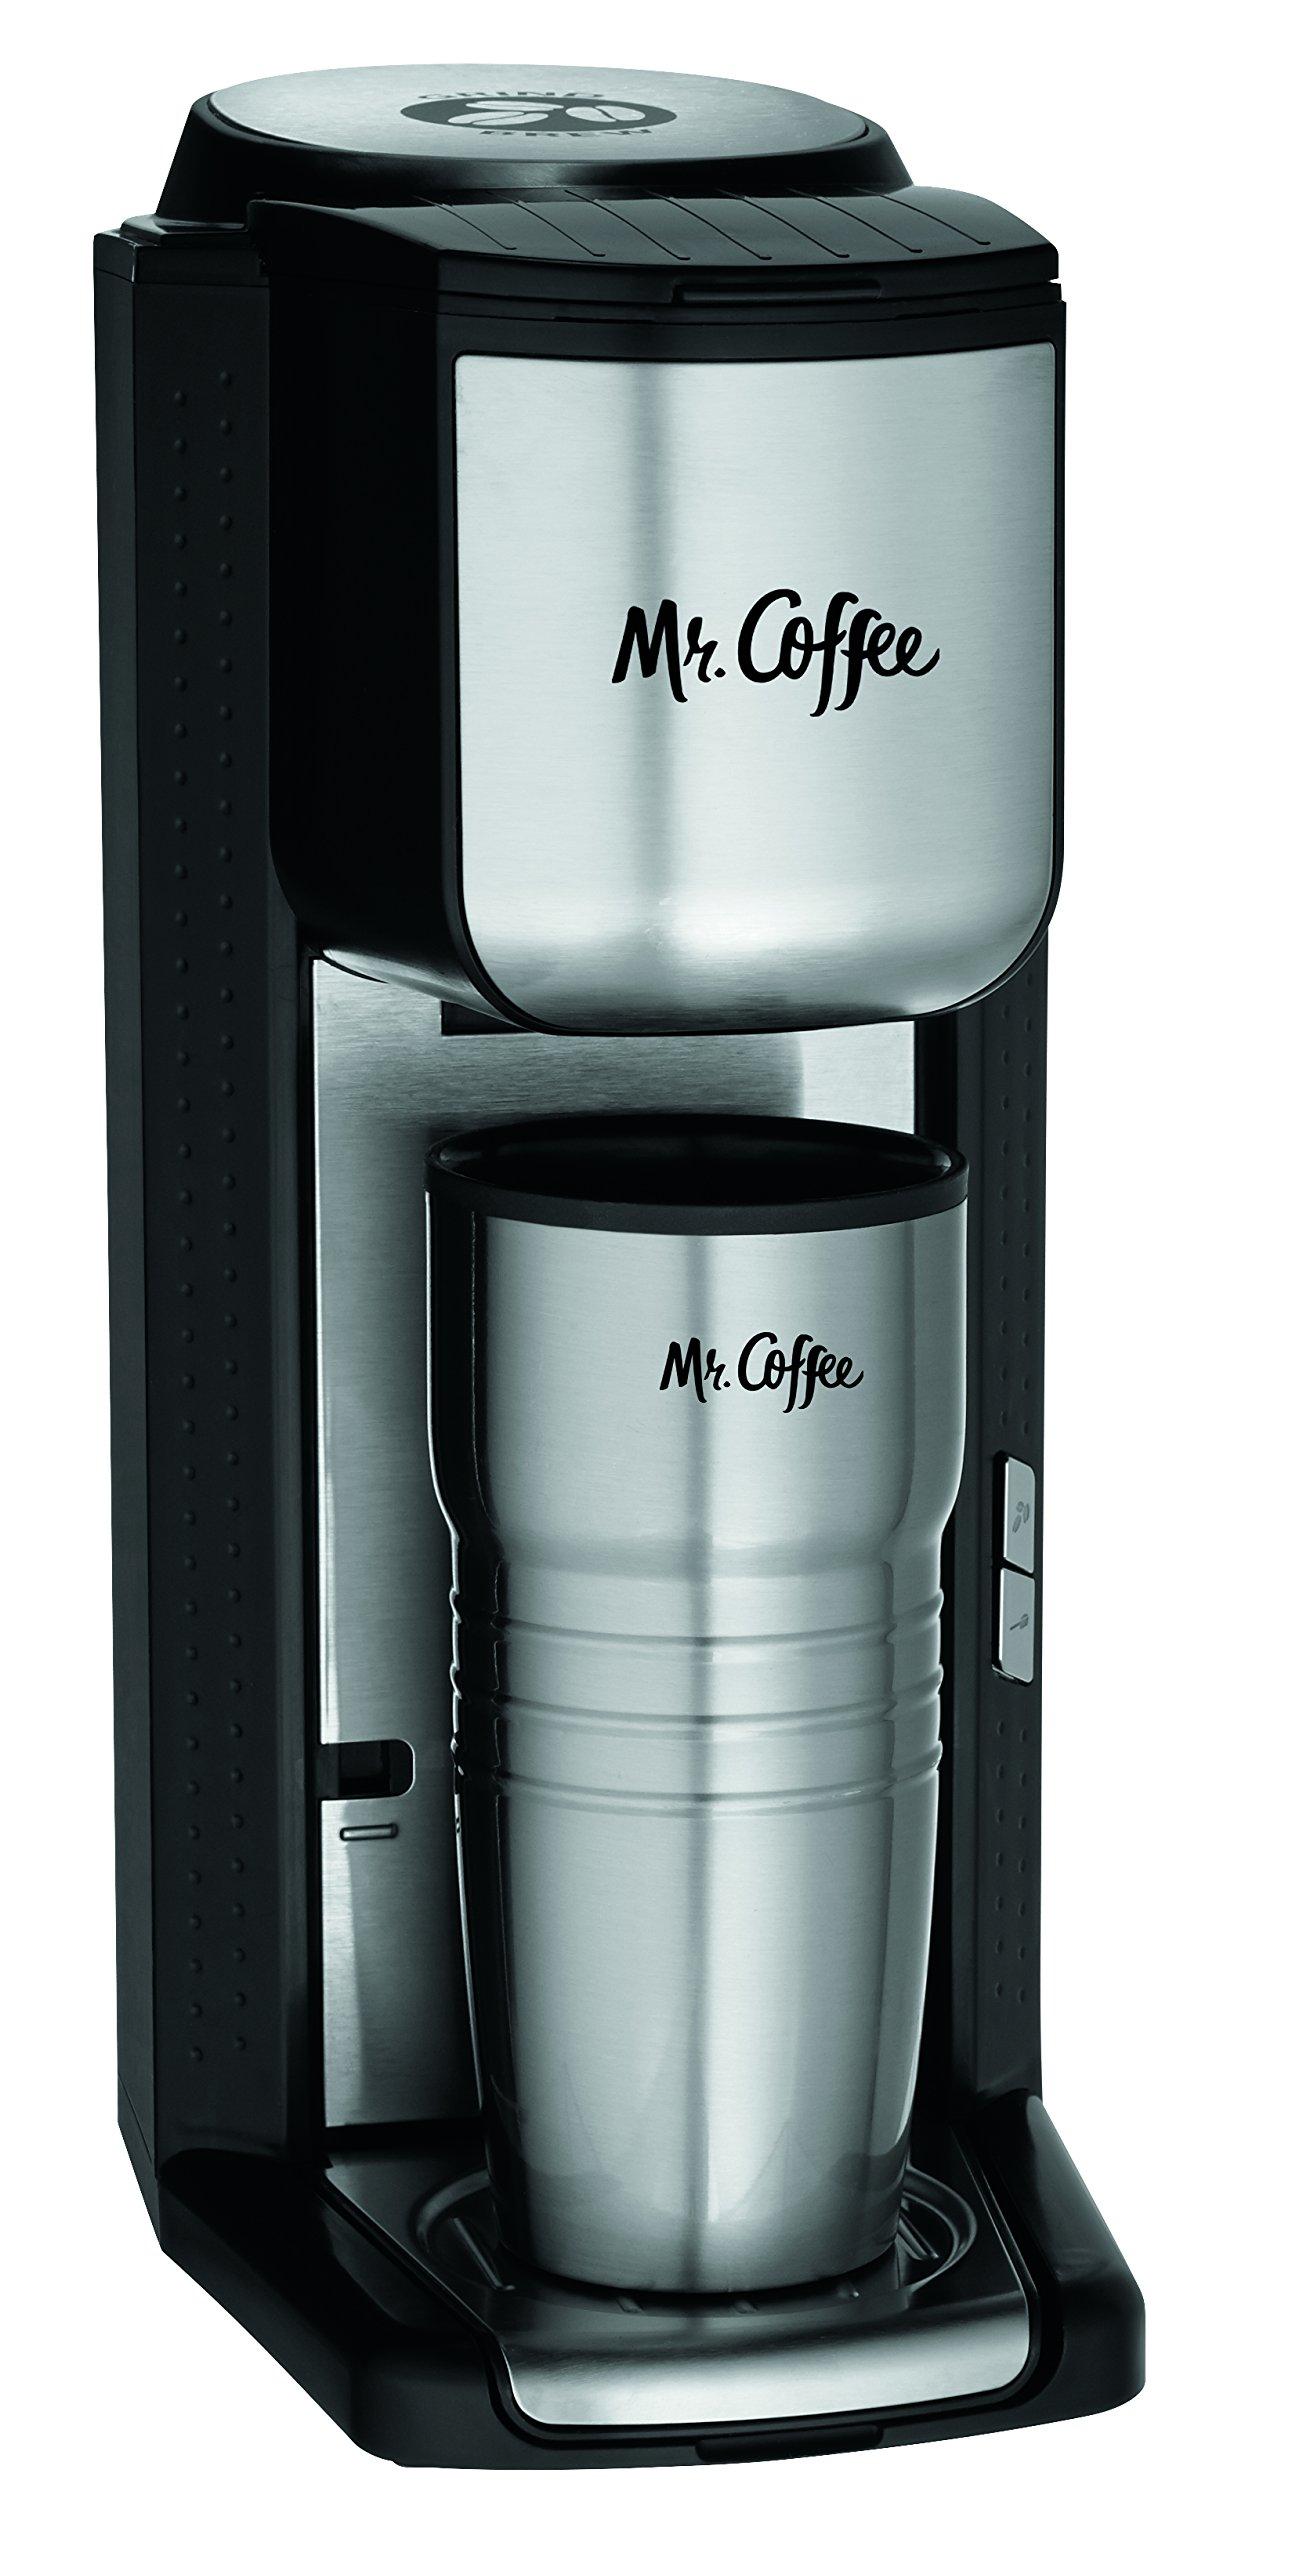 Mr Coffee Coffee Maker Plastic Taste : Mr. Coffee BVMC-SCGB200 Single Cup Coffeemaker with Built-In Grinder Black eBay